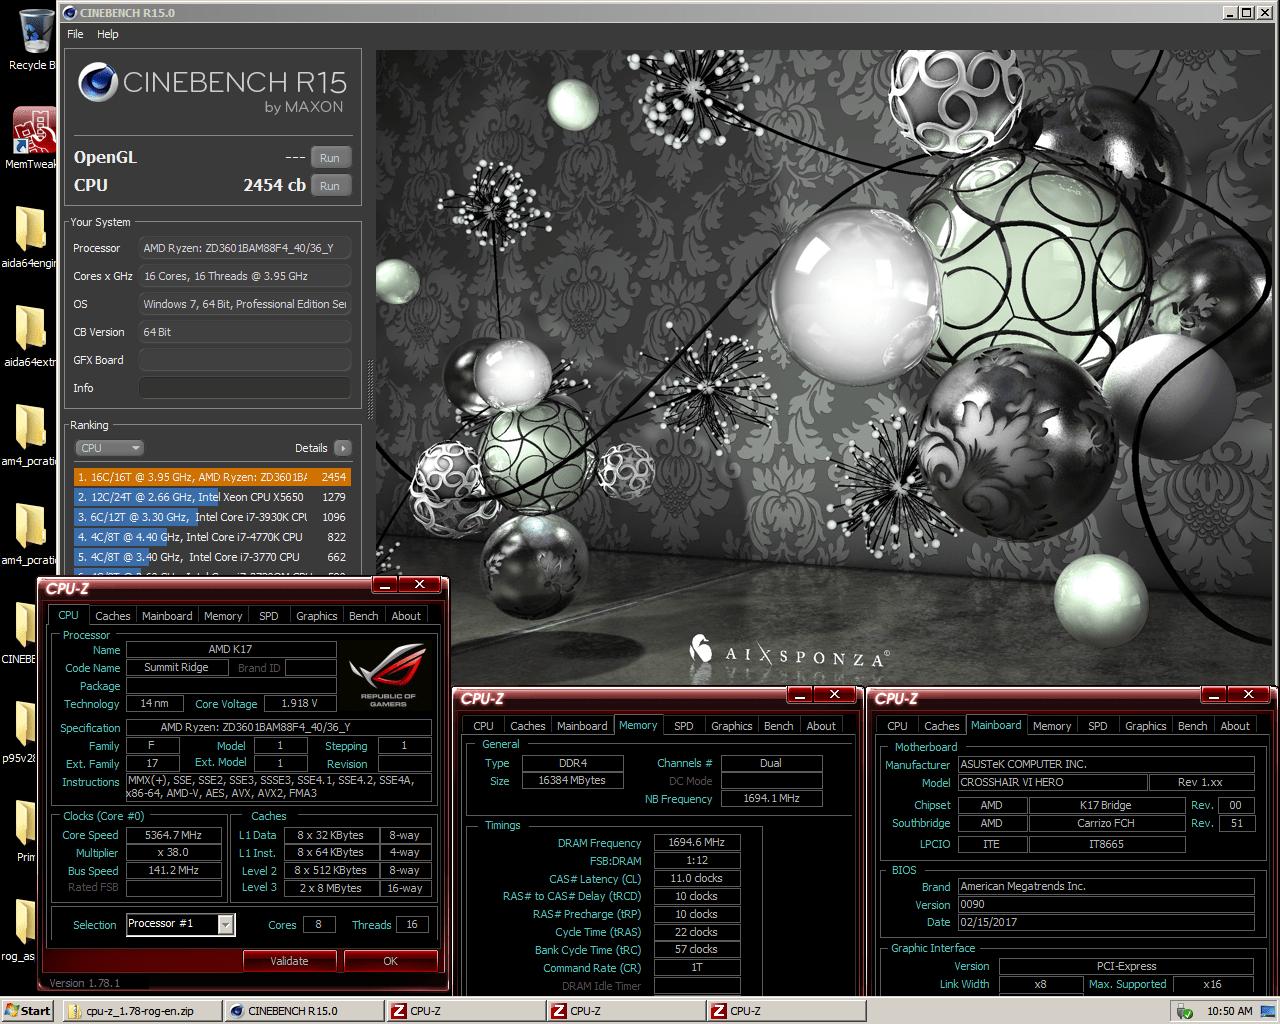 AMD R7 1800x Cinebench